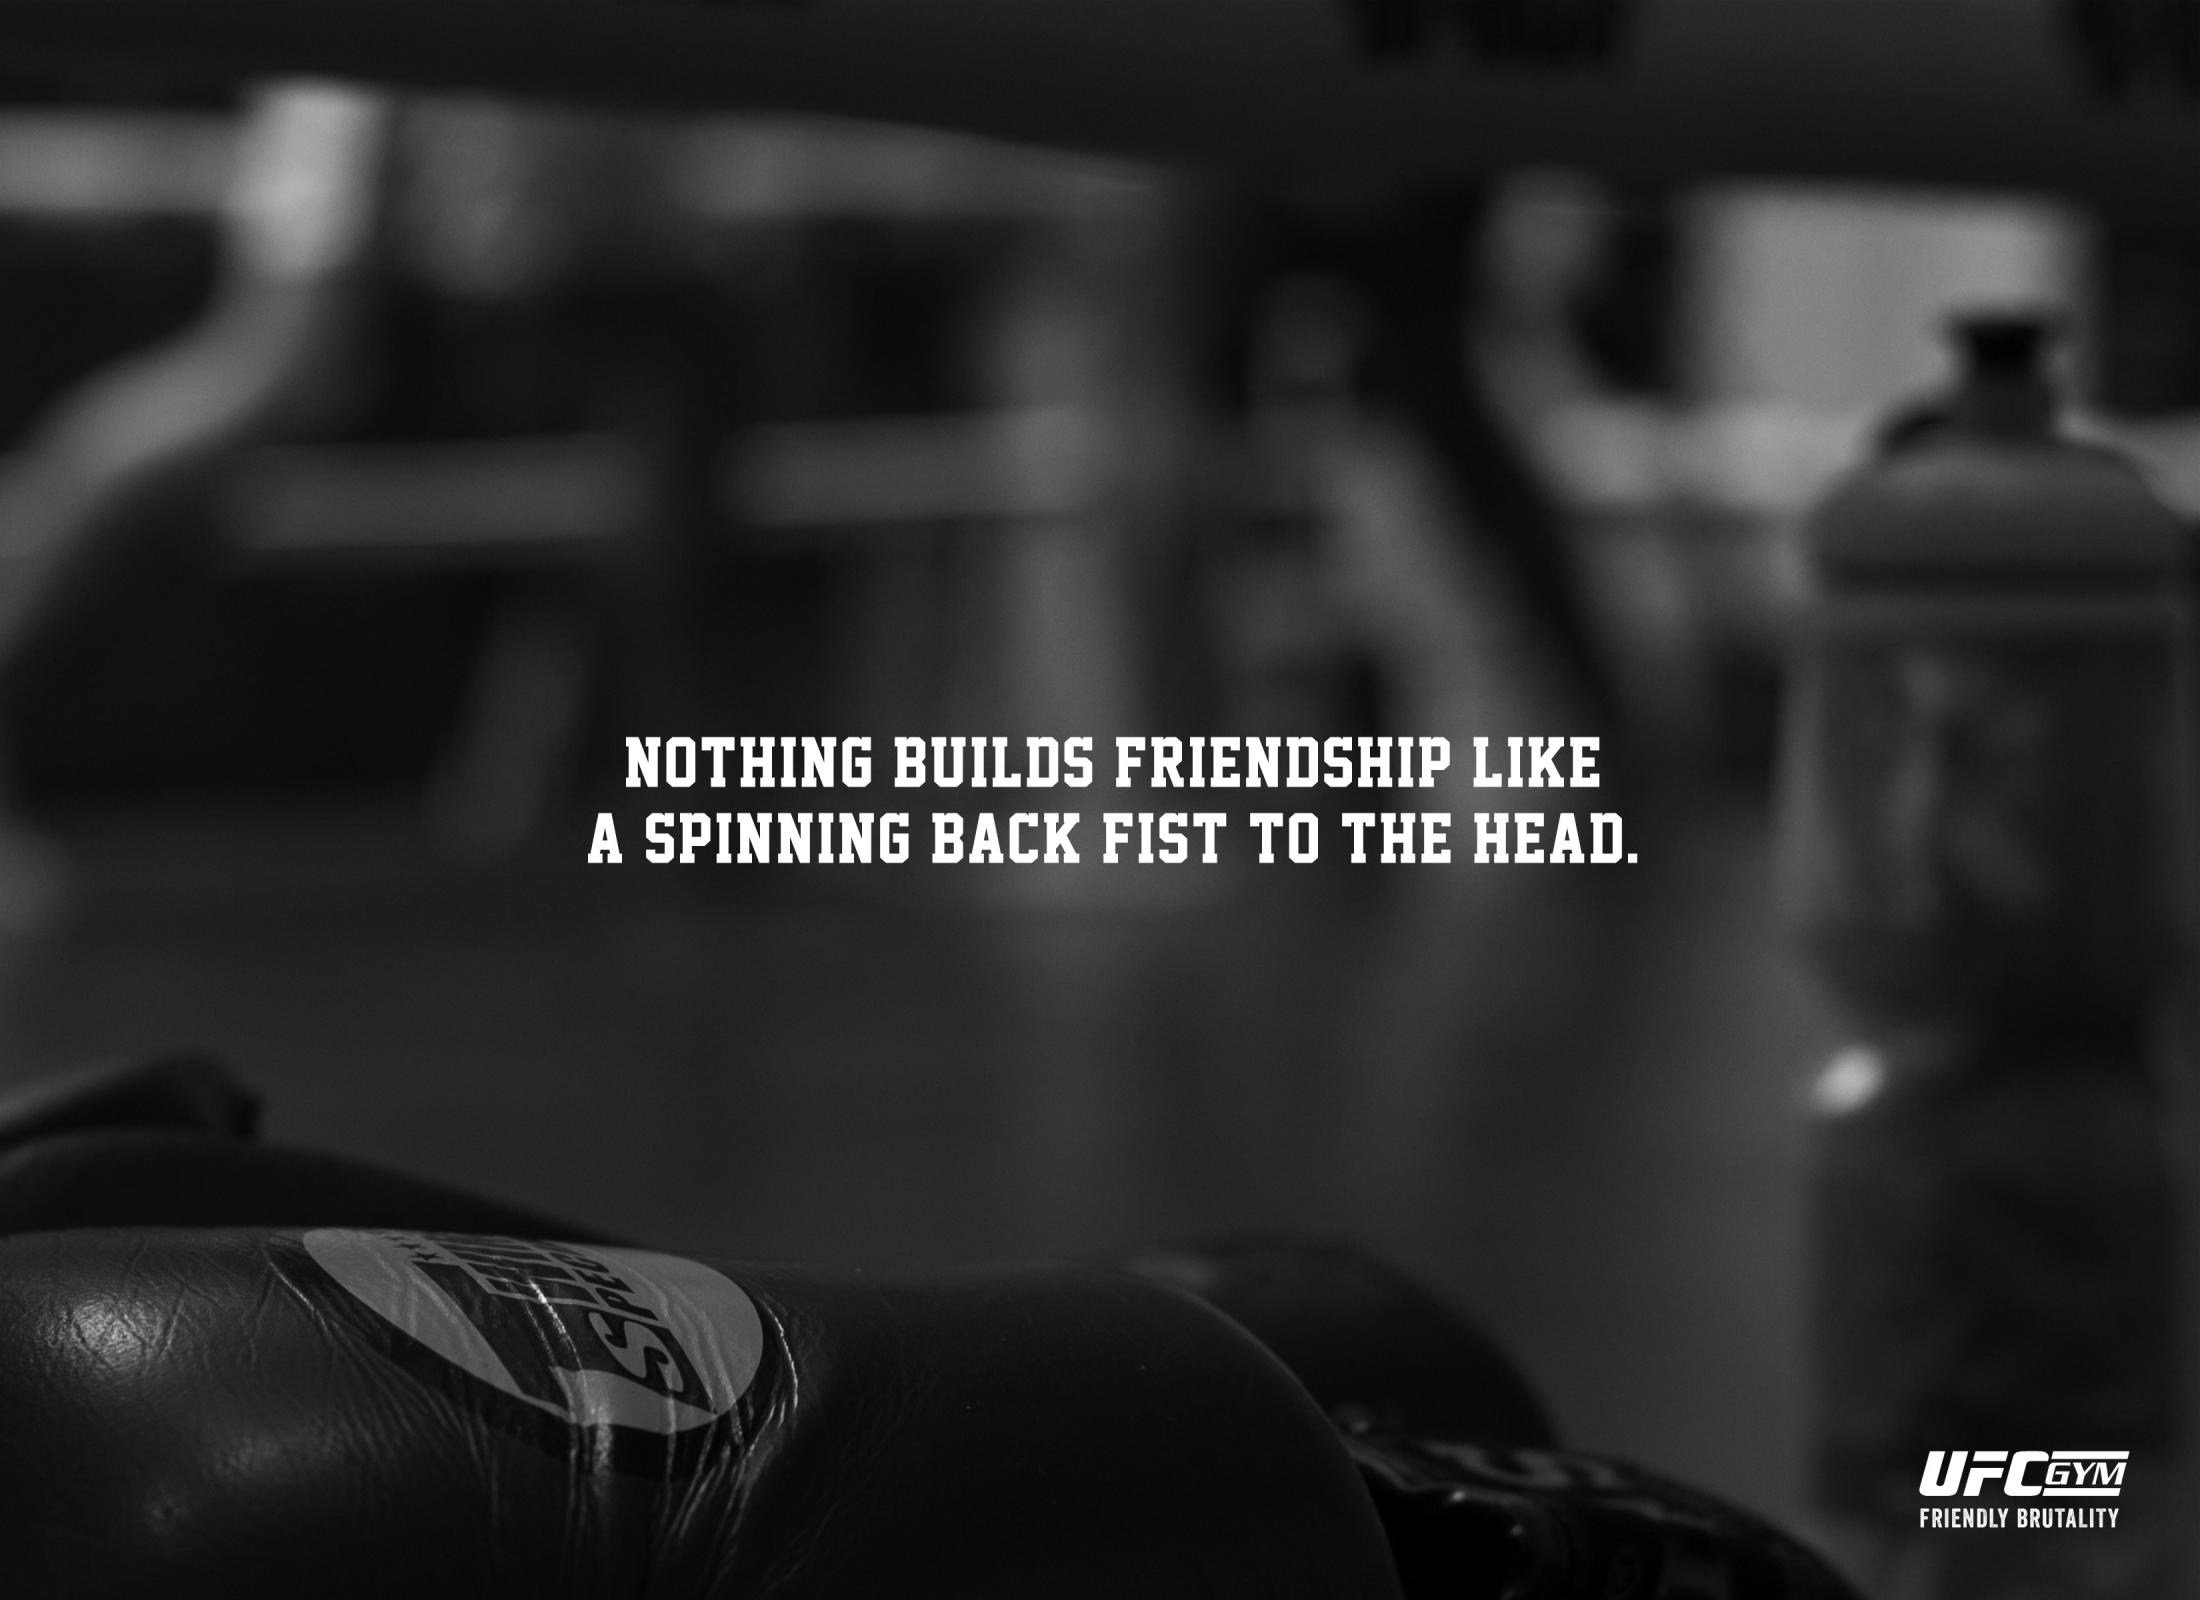 UFC Gym Print Ad - Friendly Brutality, 2